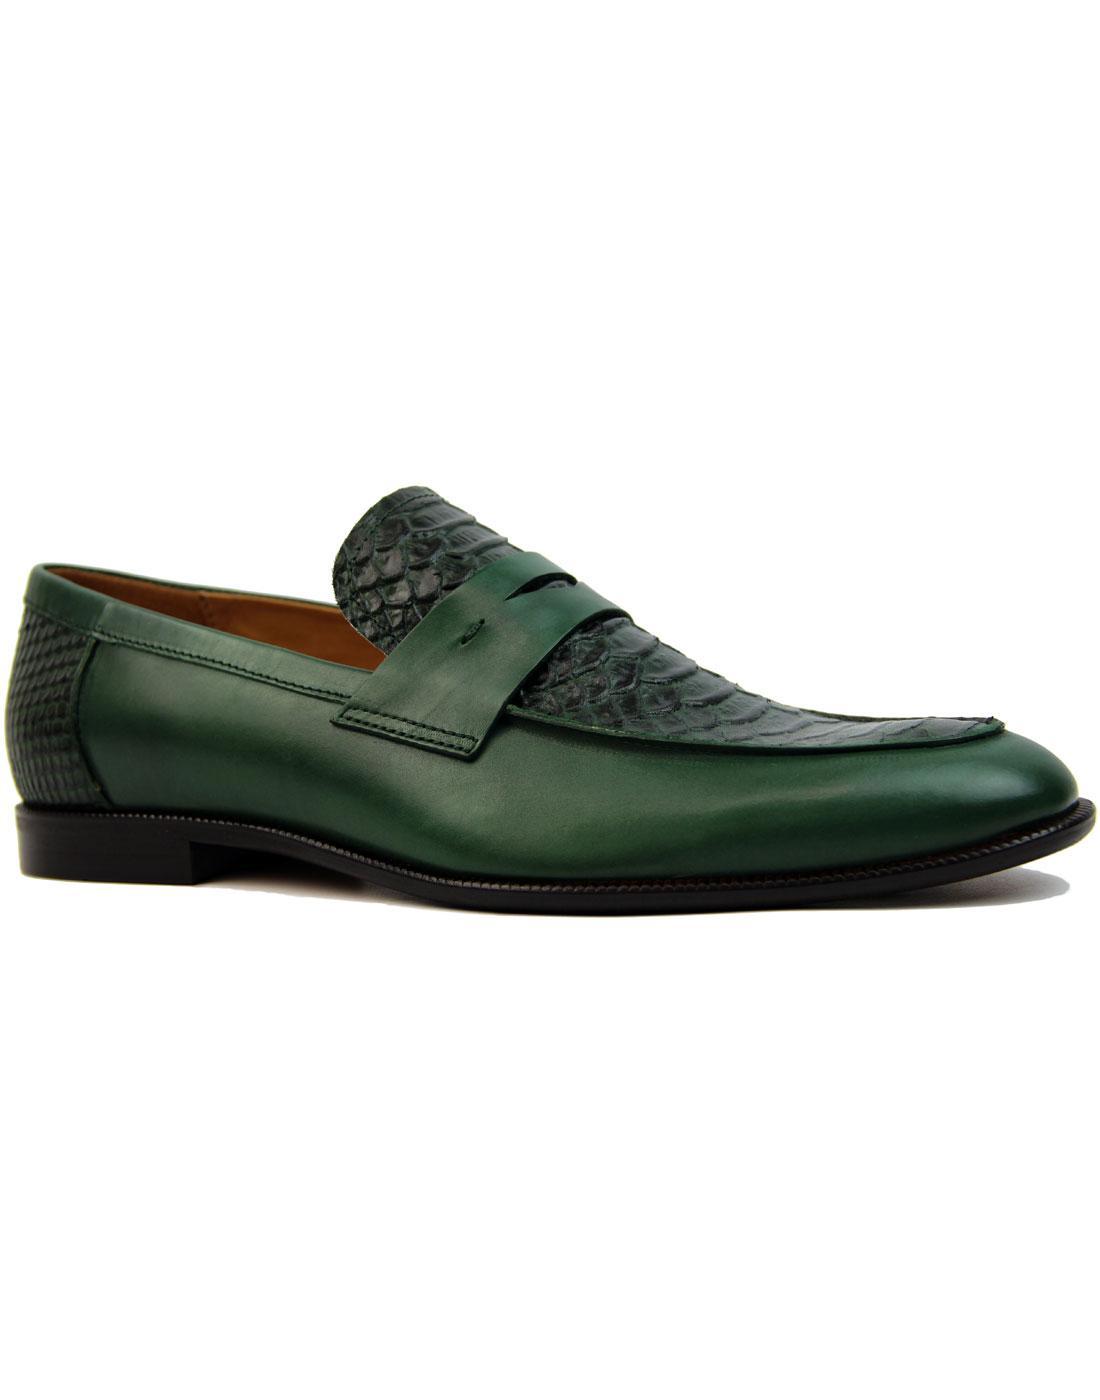 Gator LACUZZO Retro Mod Croc Stamp Loafers GREEN